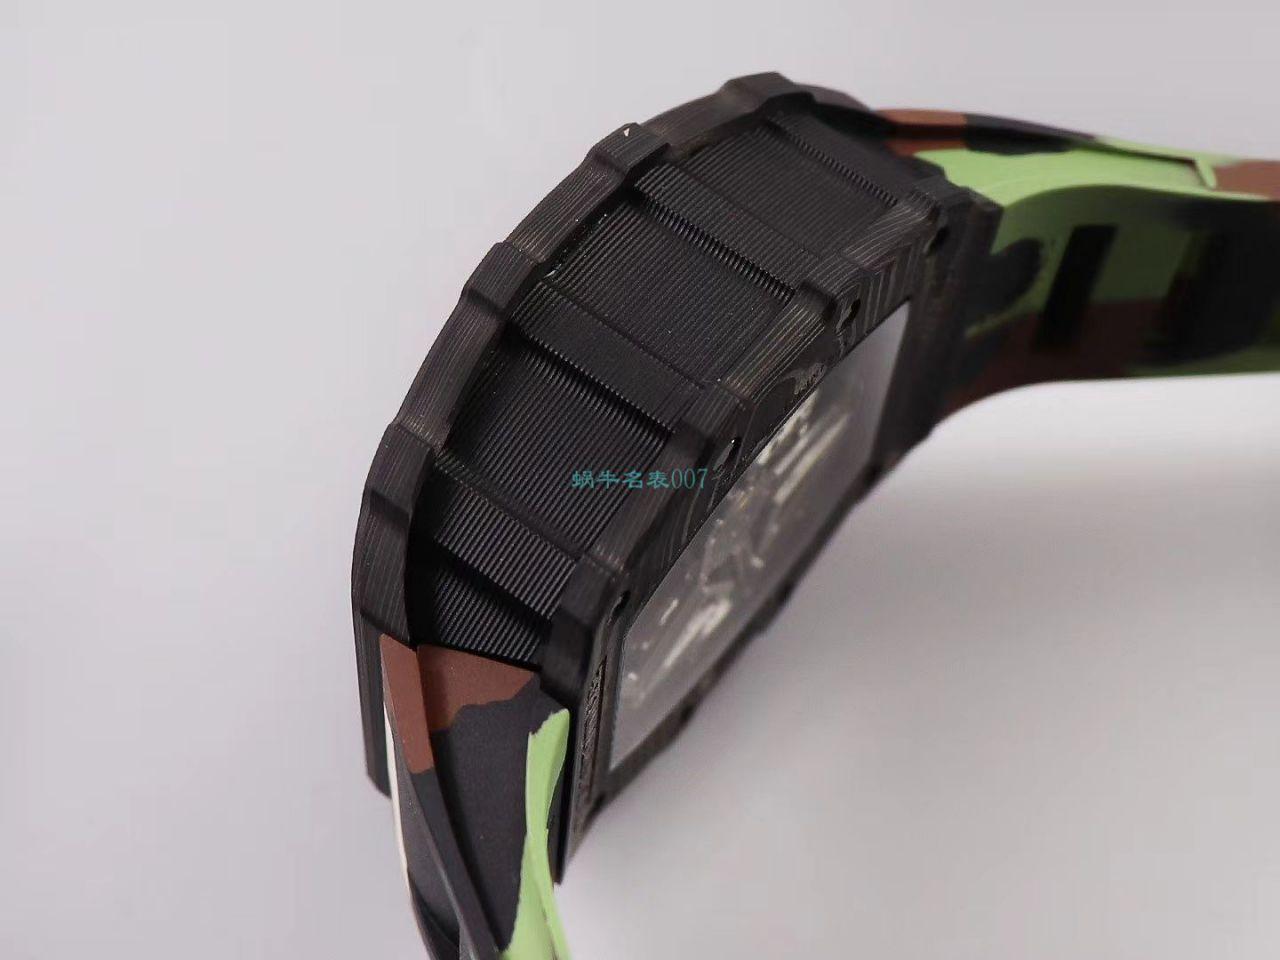 KV厂顶级复刻理查德米勒RM-011锻造碳纤维系列【原版碳纤维纹路】V2全新升级版